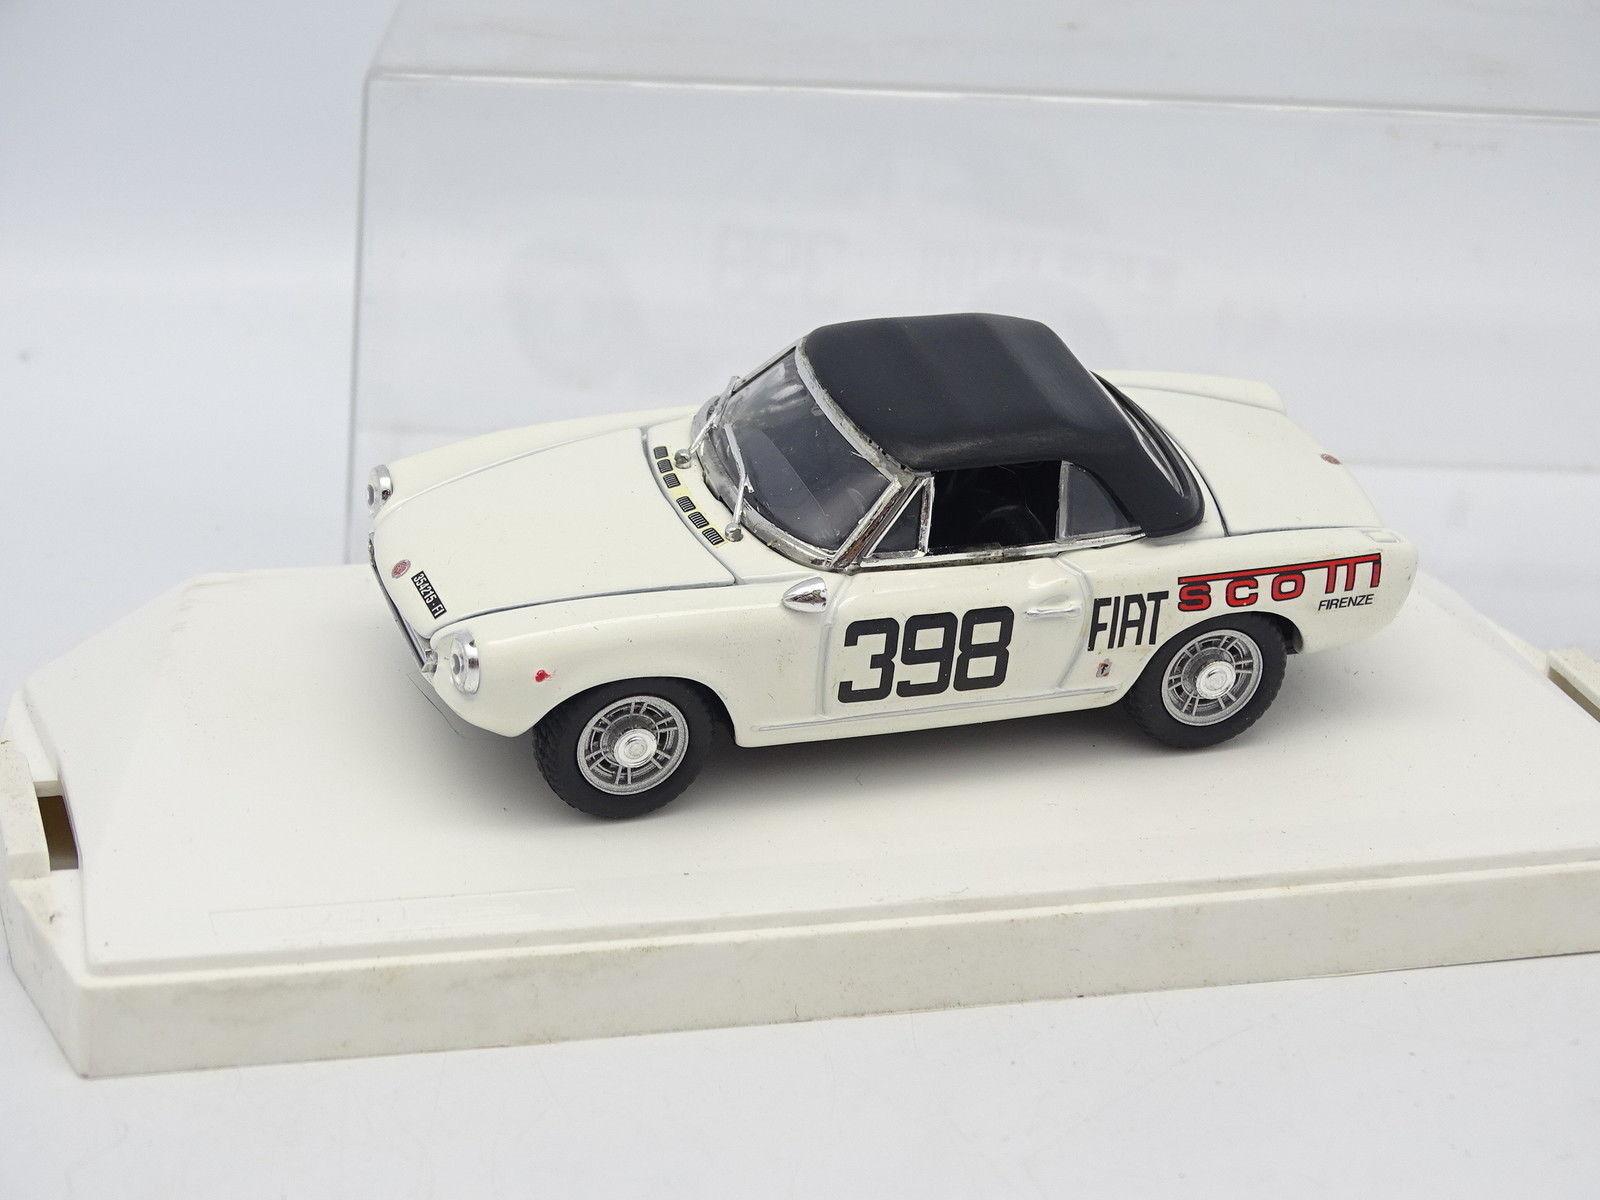 Exem 1 43 - Fiat 124 Spider Spider Spider 1400 Scotti Fiat 1968 9e1439